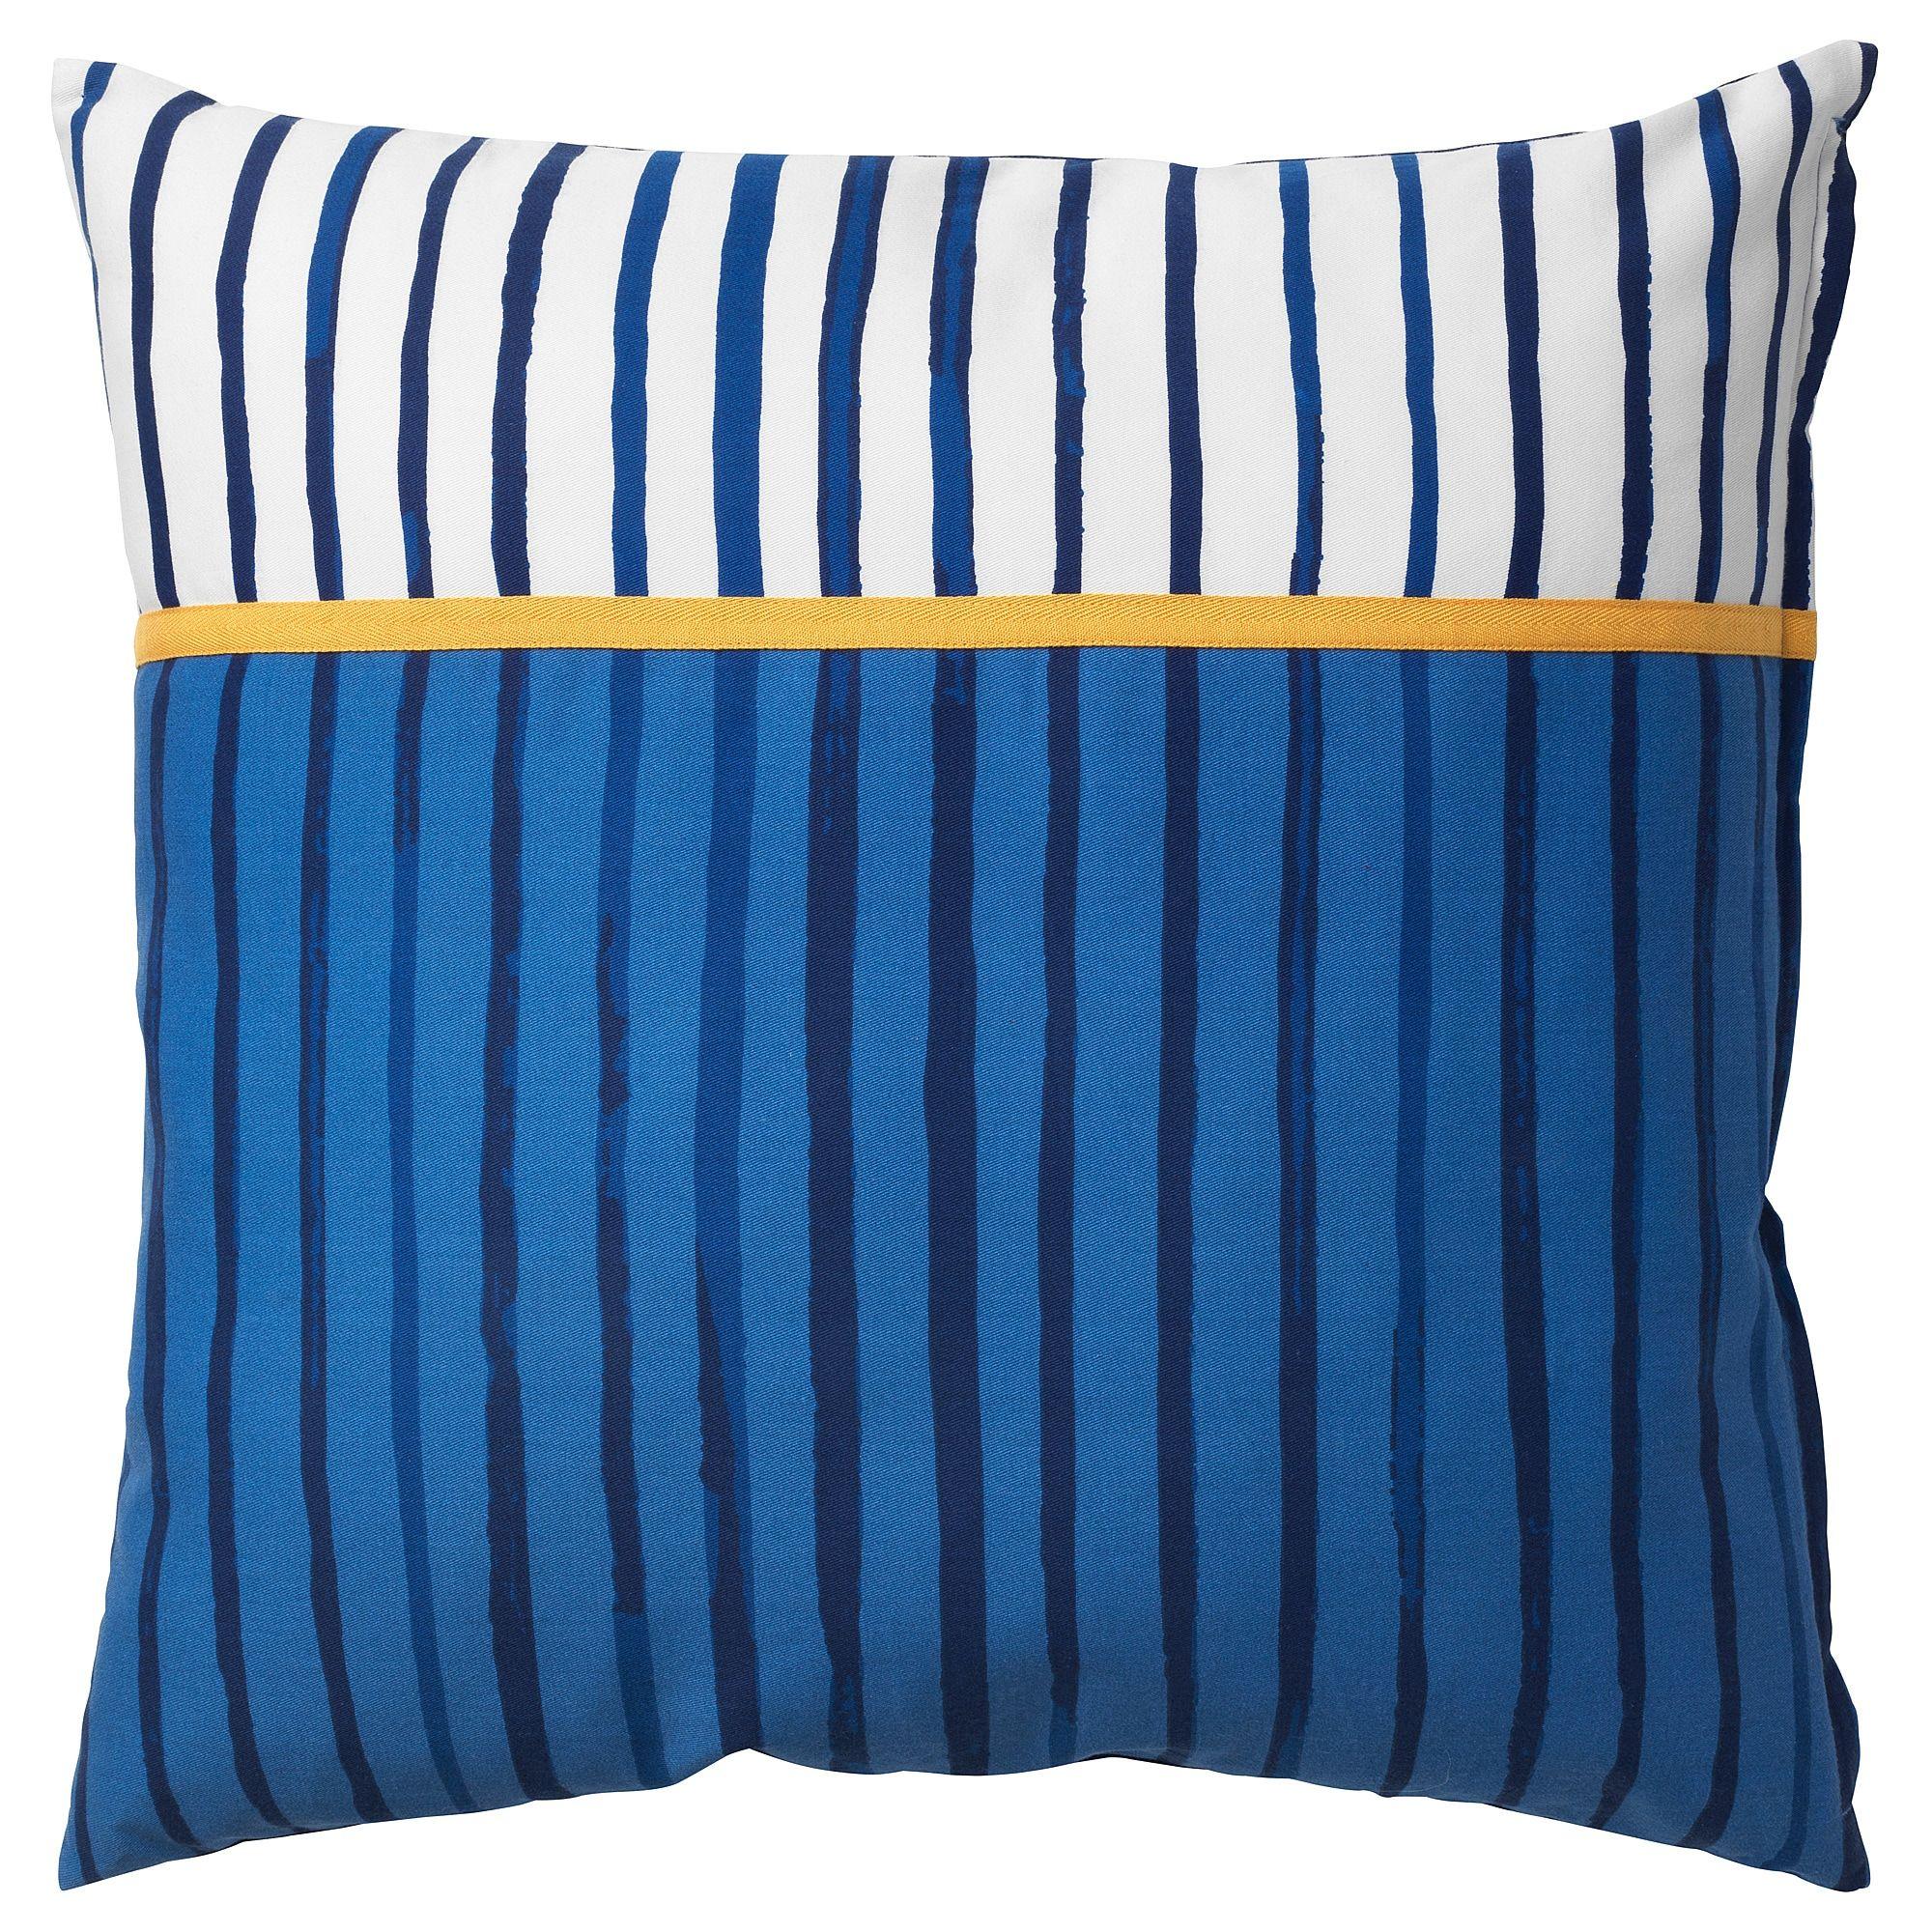 Sanglarka Cushion Stripe Blue Orange 20x20 Childrens Cushions Cushions Ikea